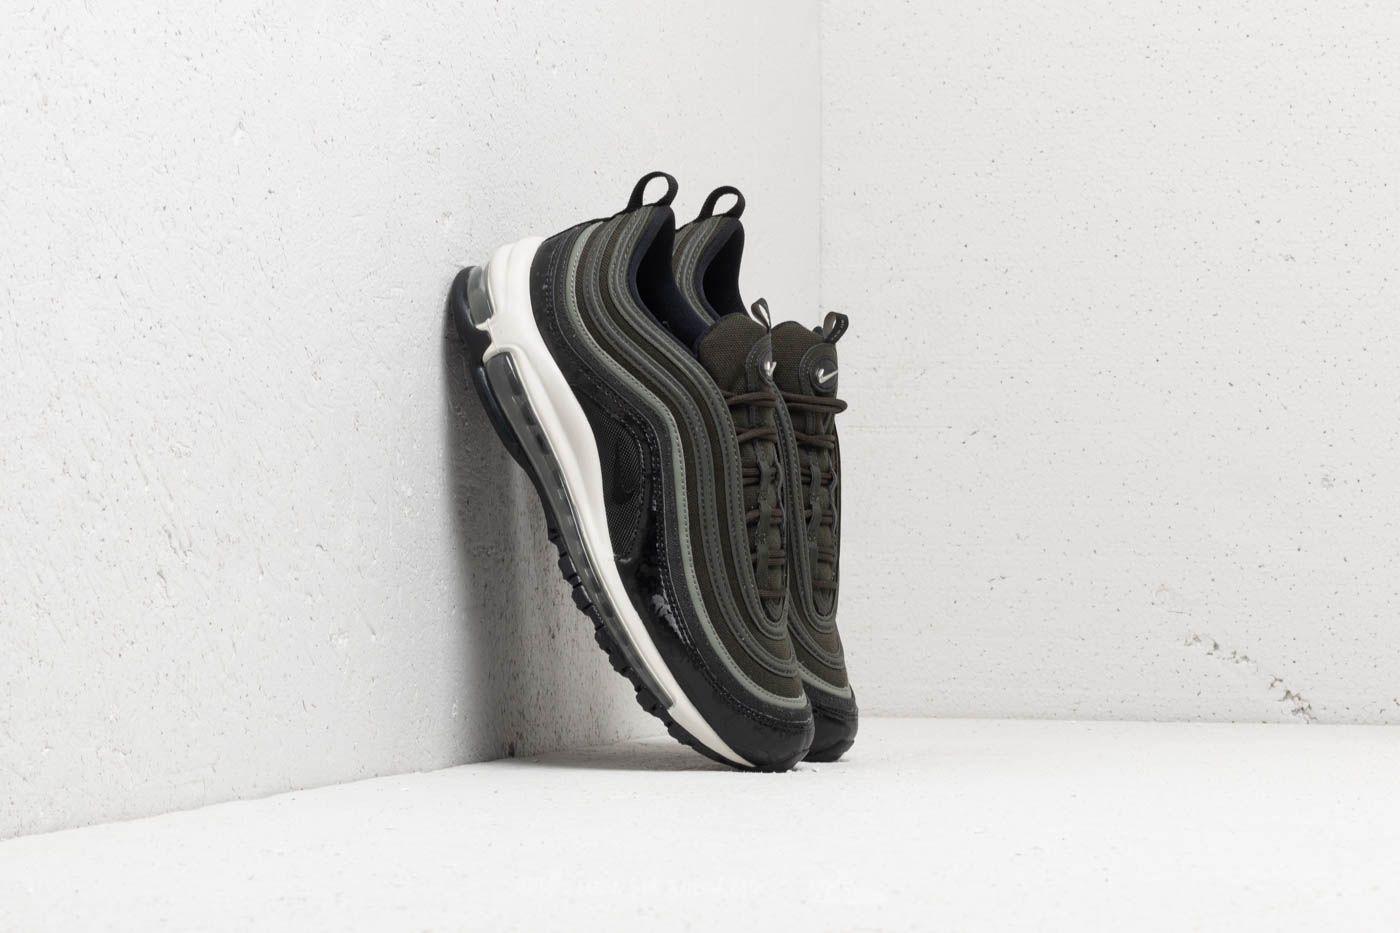 separation shoes 5a962 3e76b Nike Wmns Air Max 97 Premium Sequoia/ Dark Stucco-Light Bone | Footshop